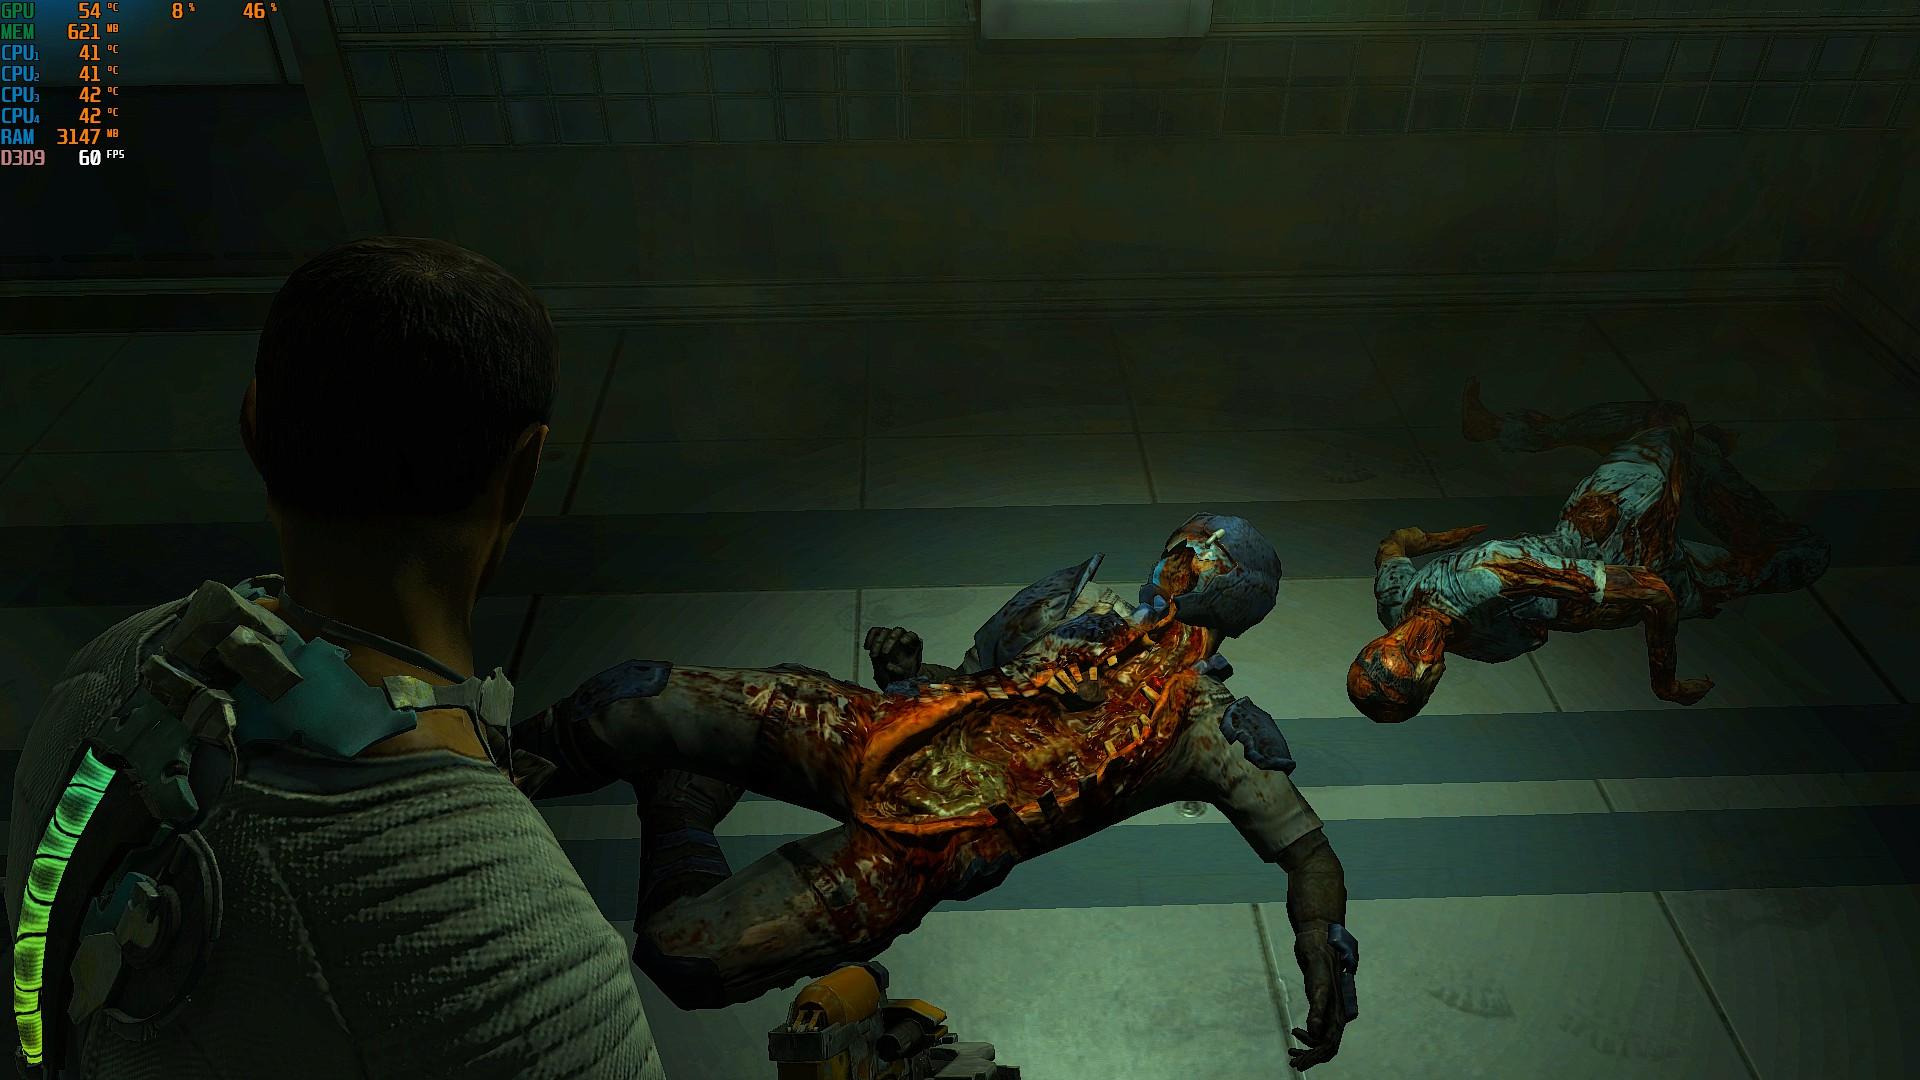 00035.Jpg - Dead Space 2